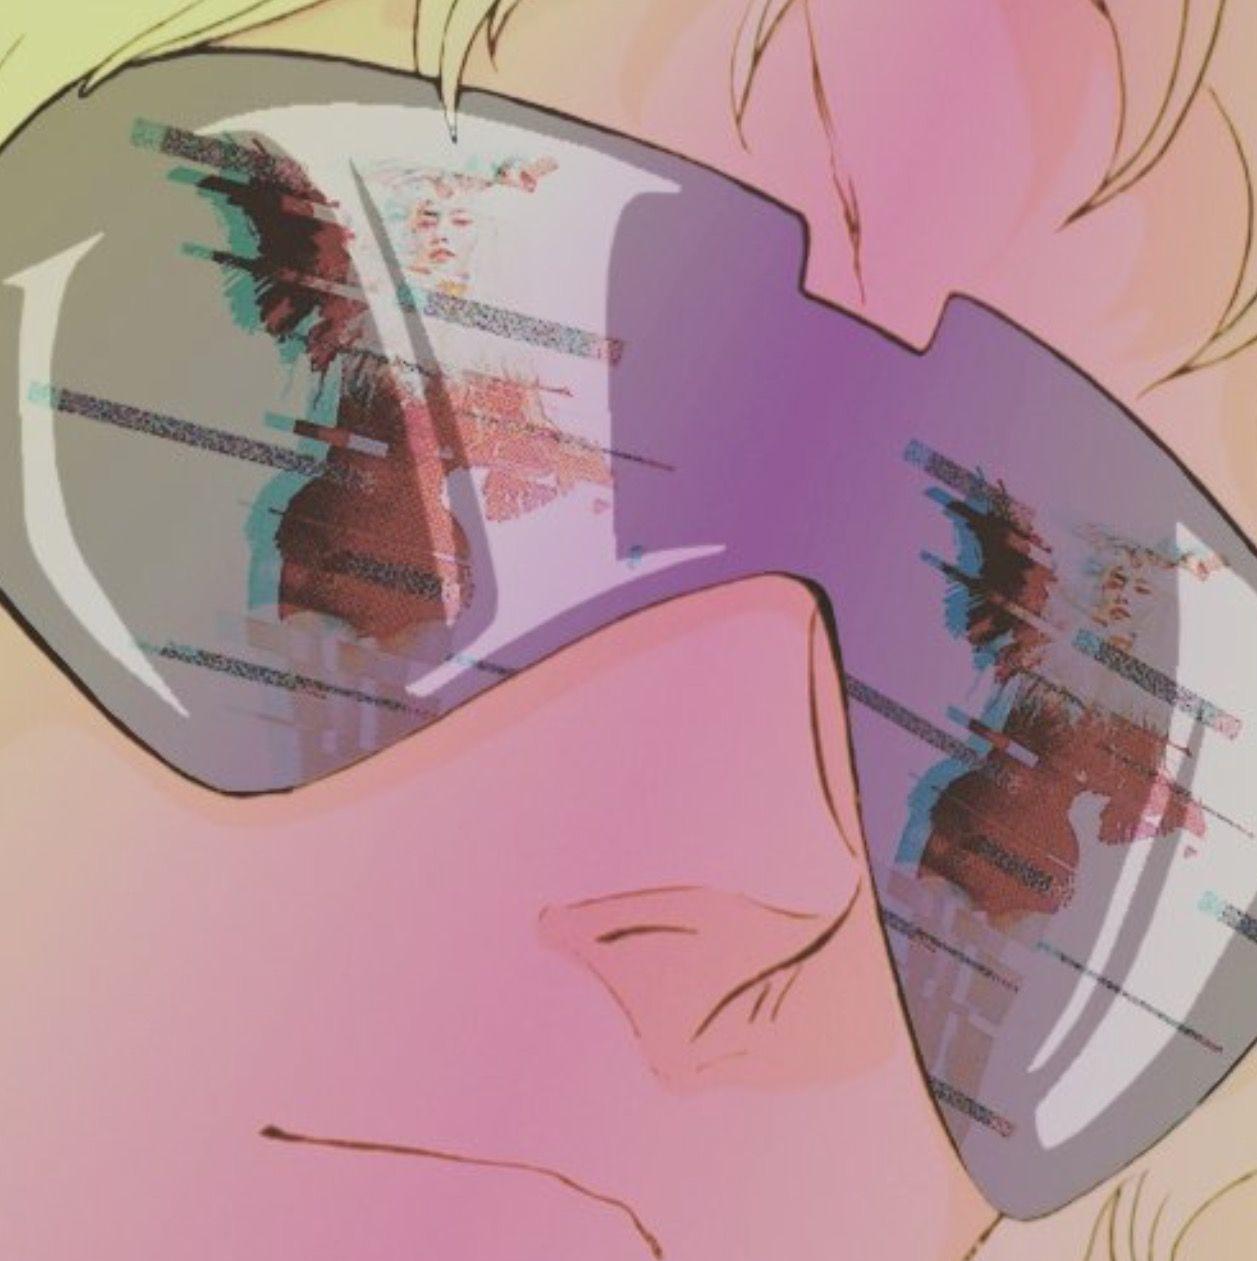 Anime Aesthetic Retro Futurism Anime Anime Wallpaper